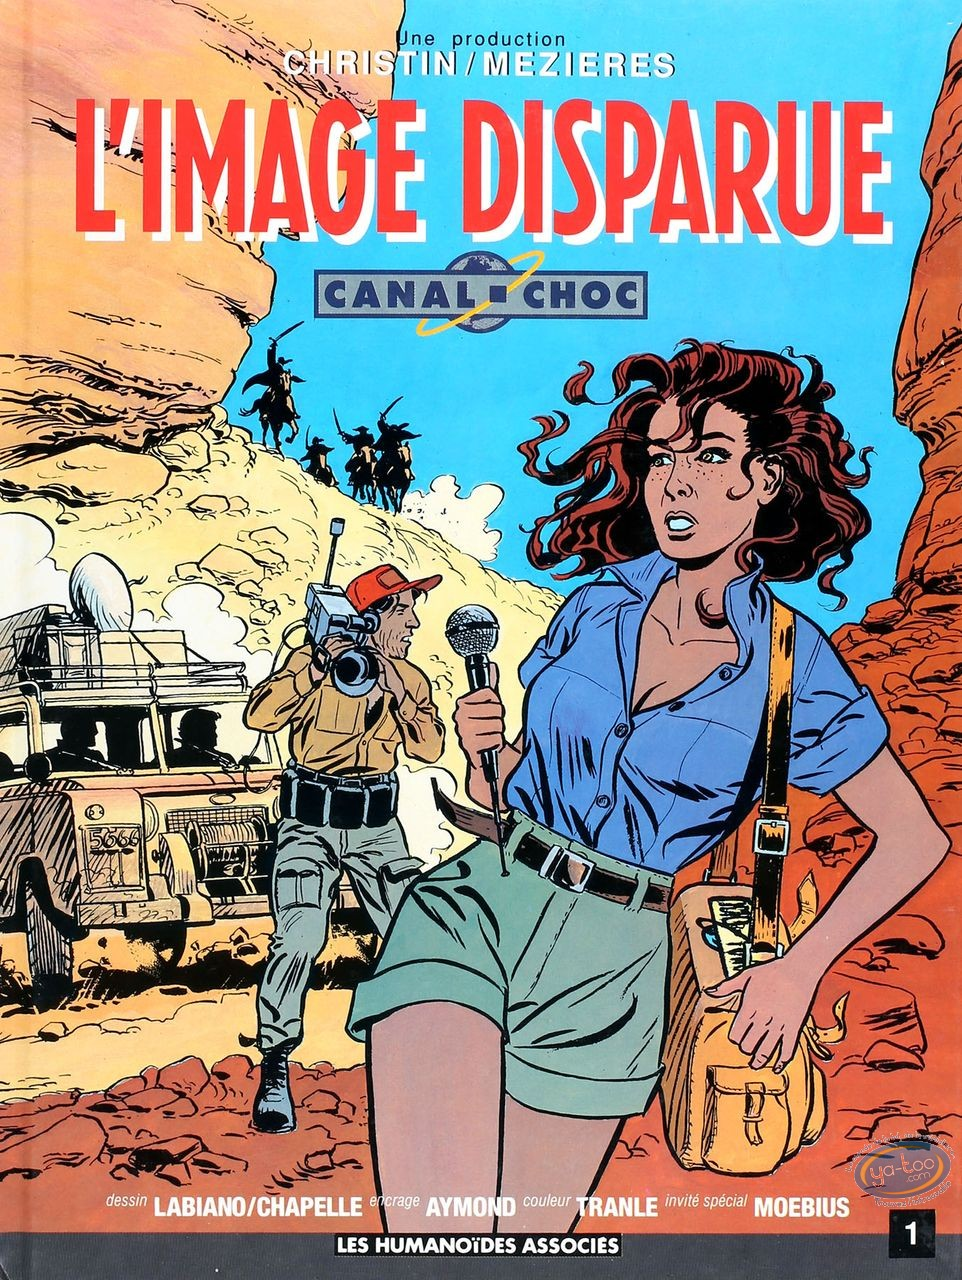 Listed European Comic Books, Canal Choc : L'image disparue